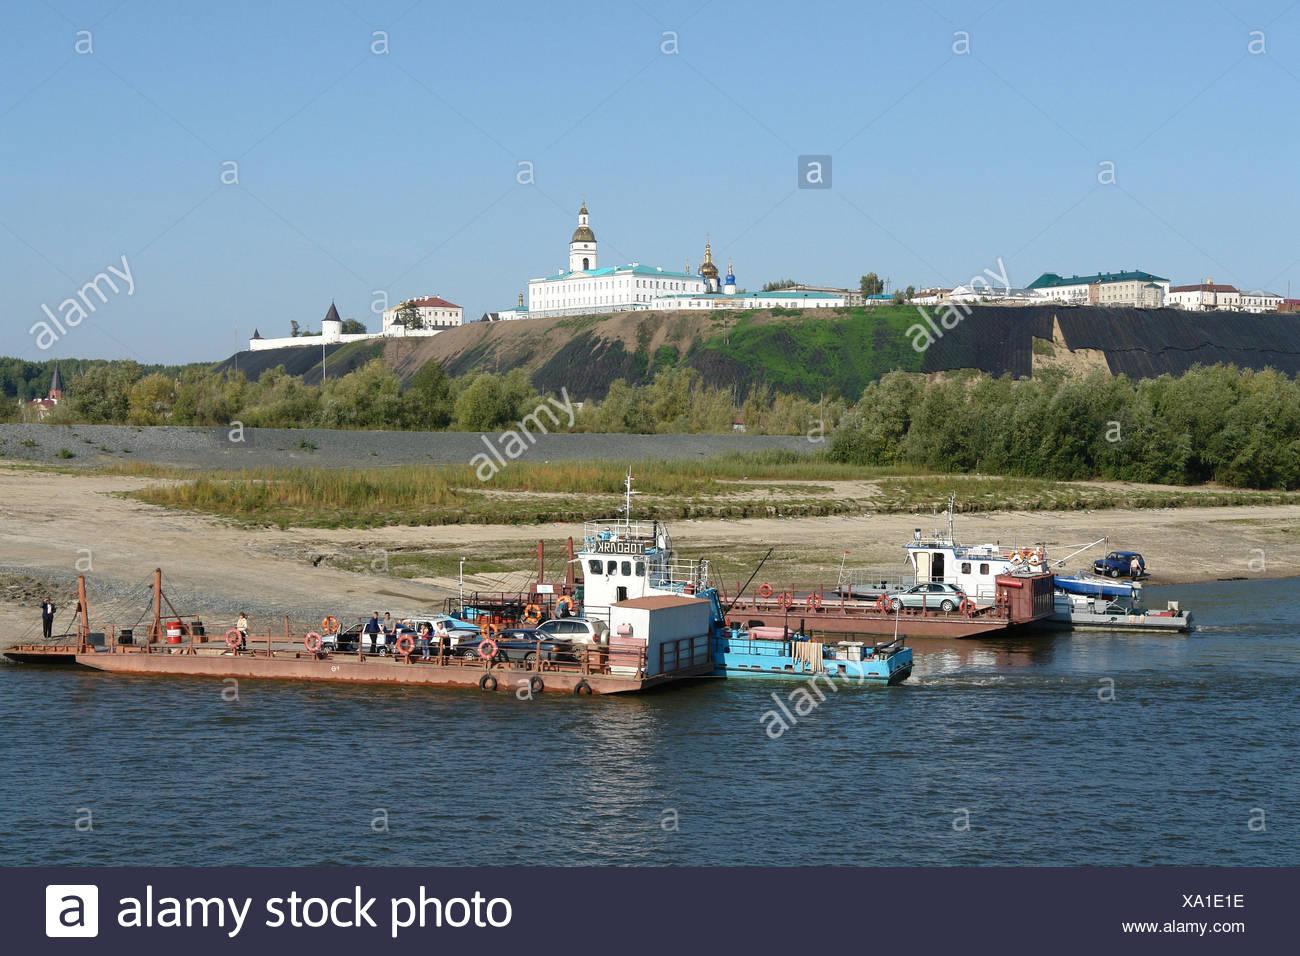 Russia, Tobolsk, flux Irtysch, ferryboats, shores, Kremlin, - Stock Image